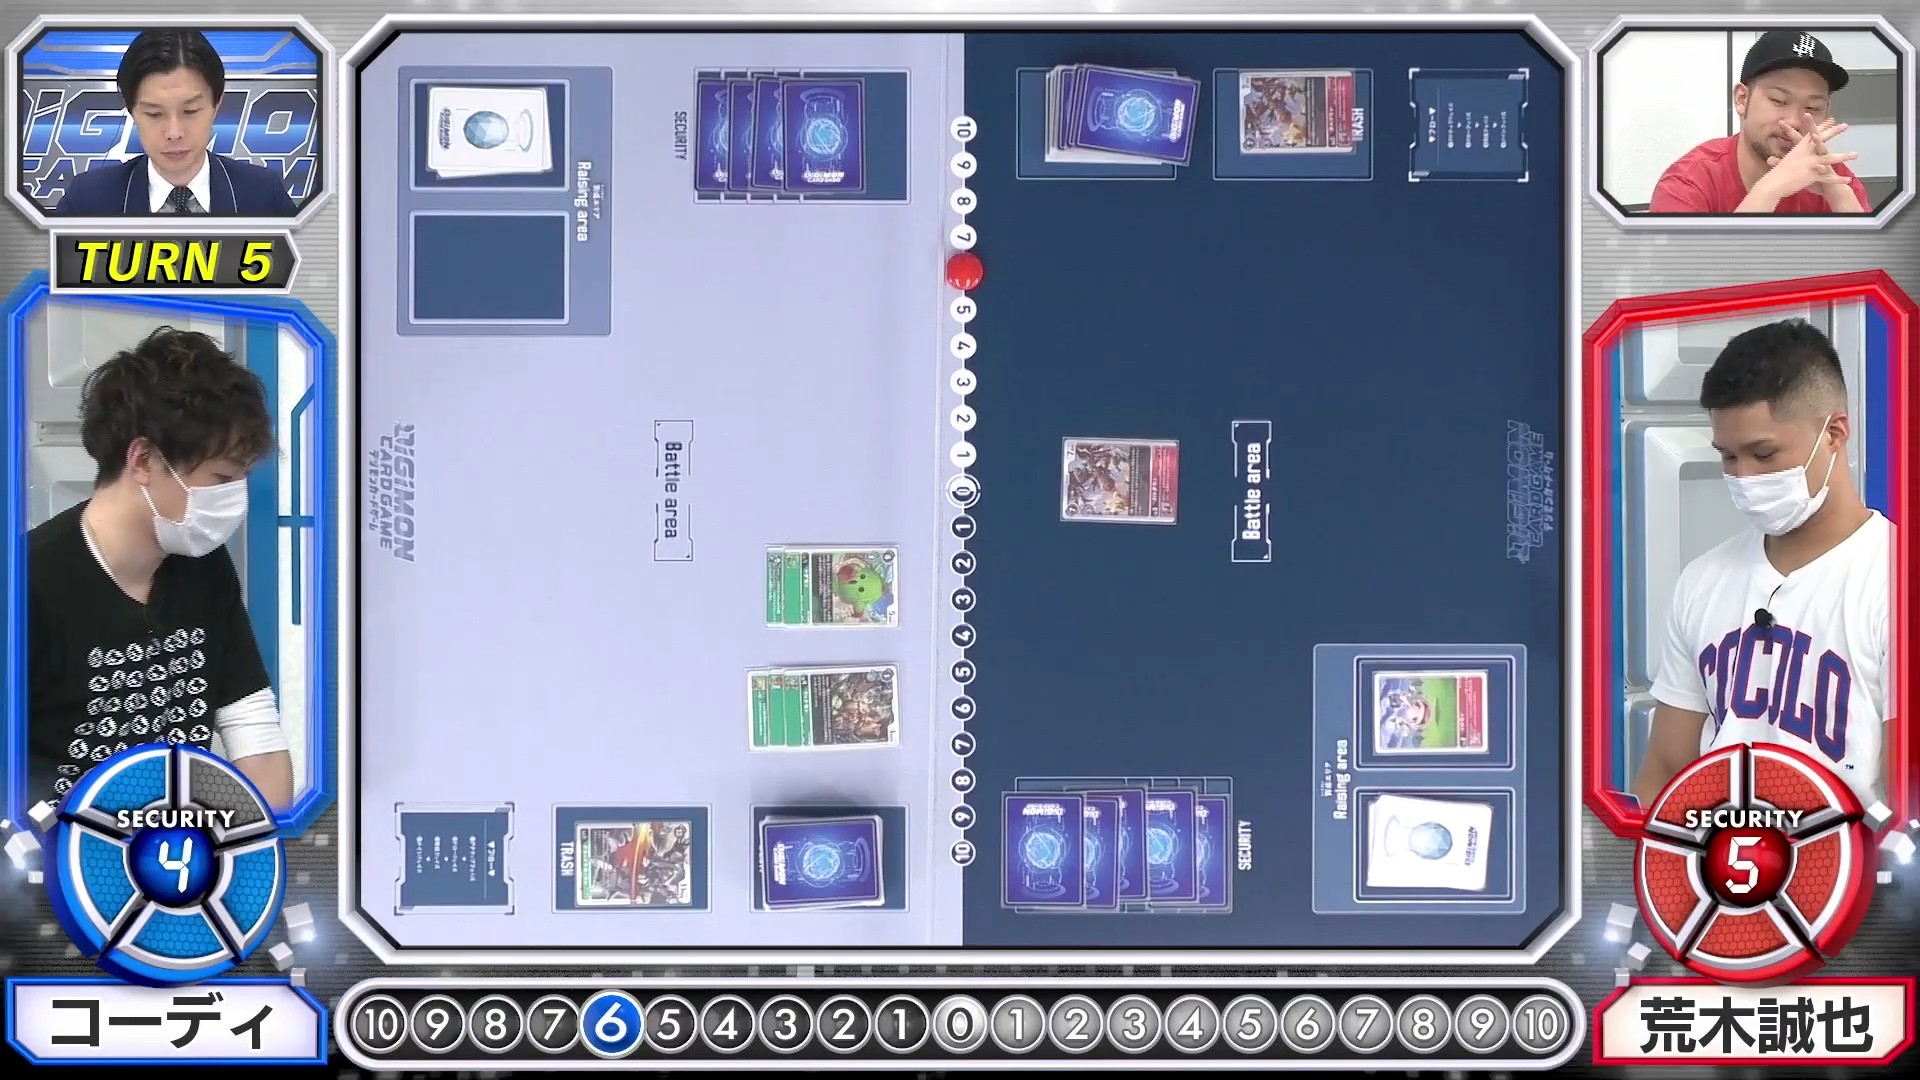 cardgamebattle5_2_june12_2020.jpg